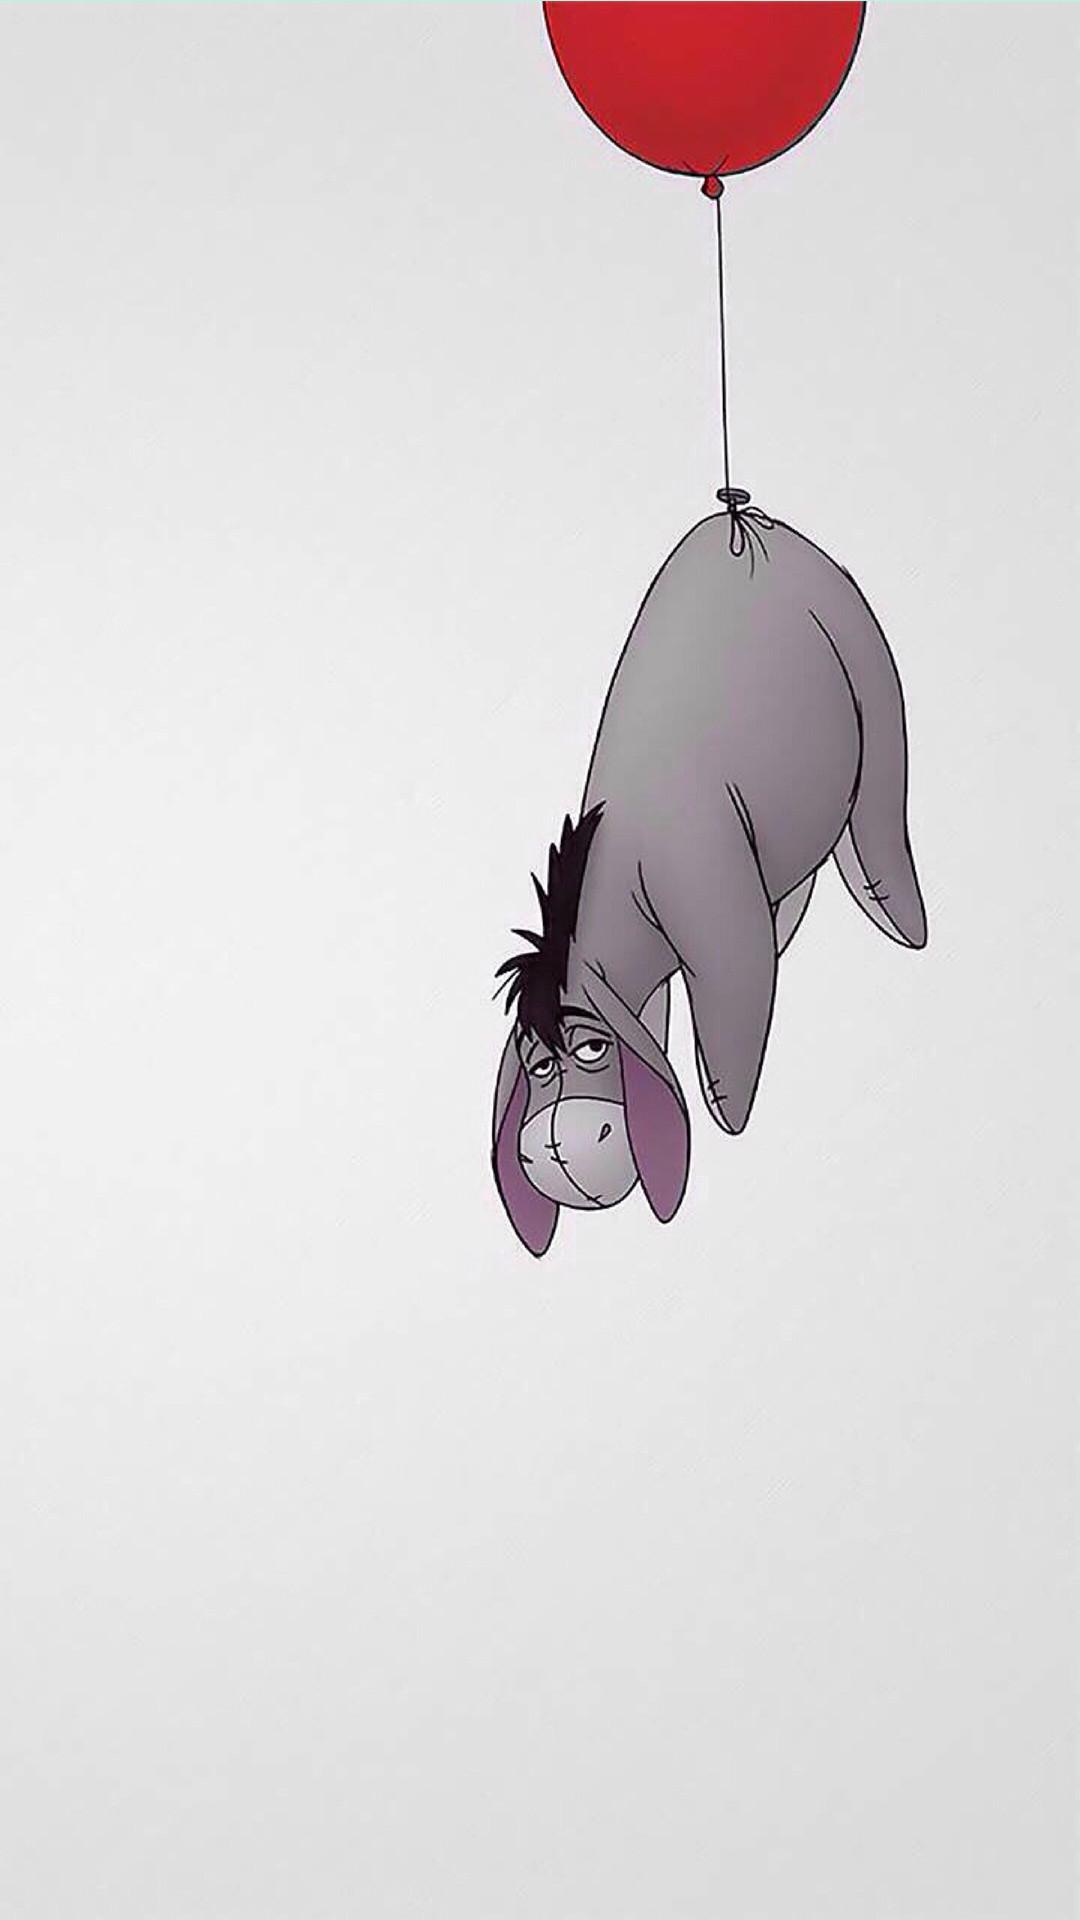 Eeyore Winnie The Pooh iPhone 6+ HD Wallpaper – https://freebestpicture.